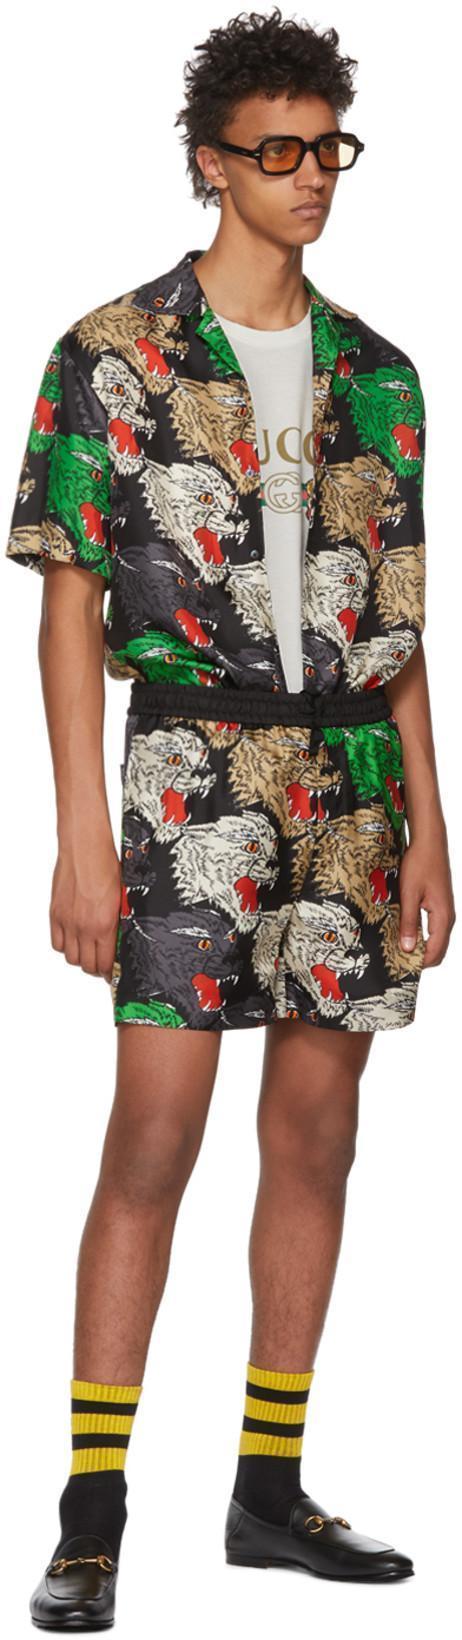 4c9a395d2f45 GUCCI Men's Multicolor Panther-Print Silk Shirt, Black in Multicolour